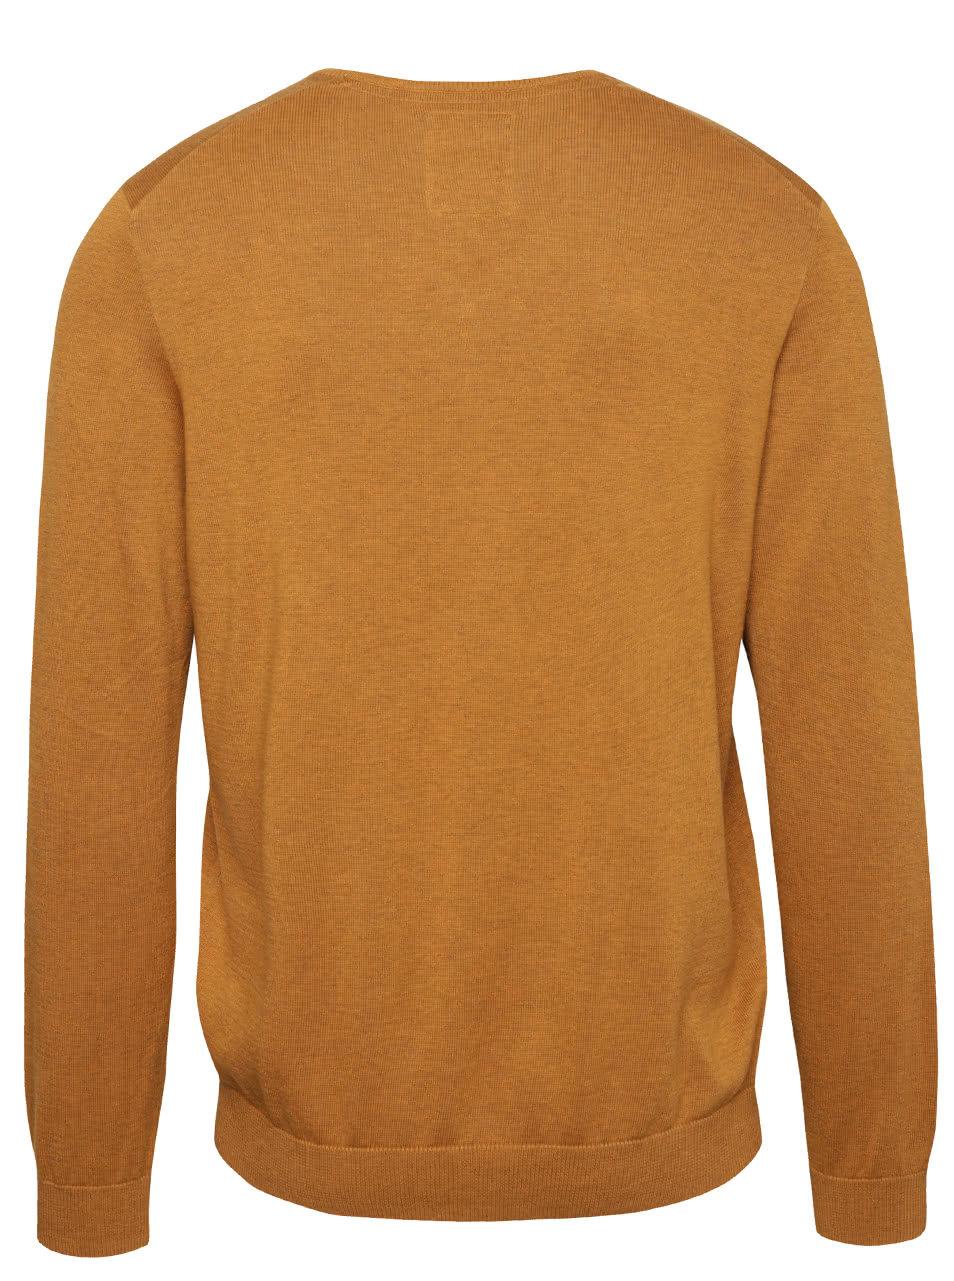 09cb1e2cd292 Hnedý pánsky sveter s.Oliver